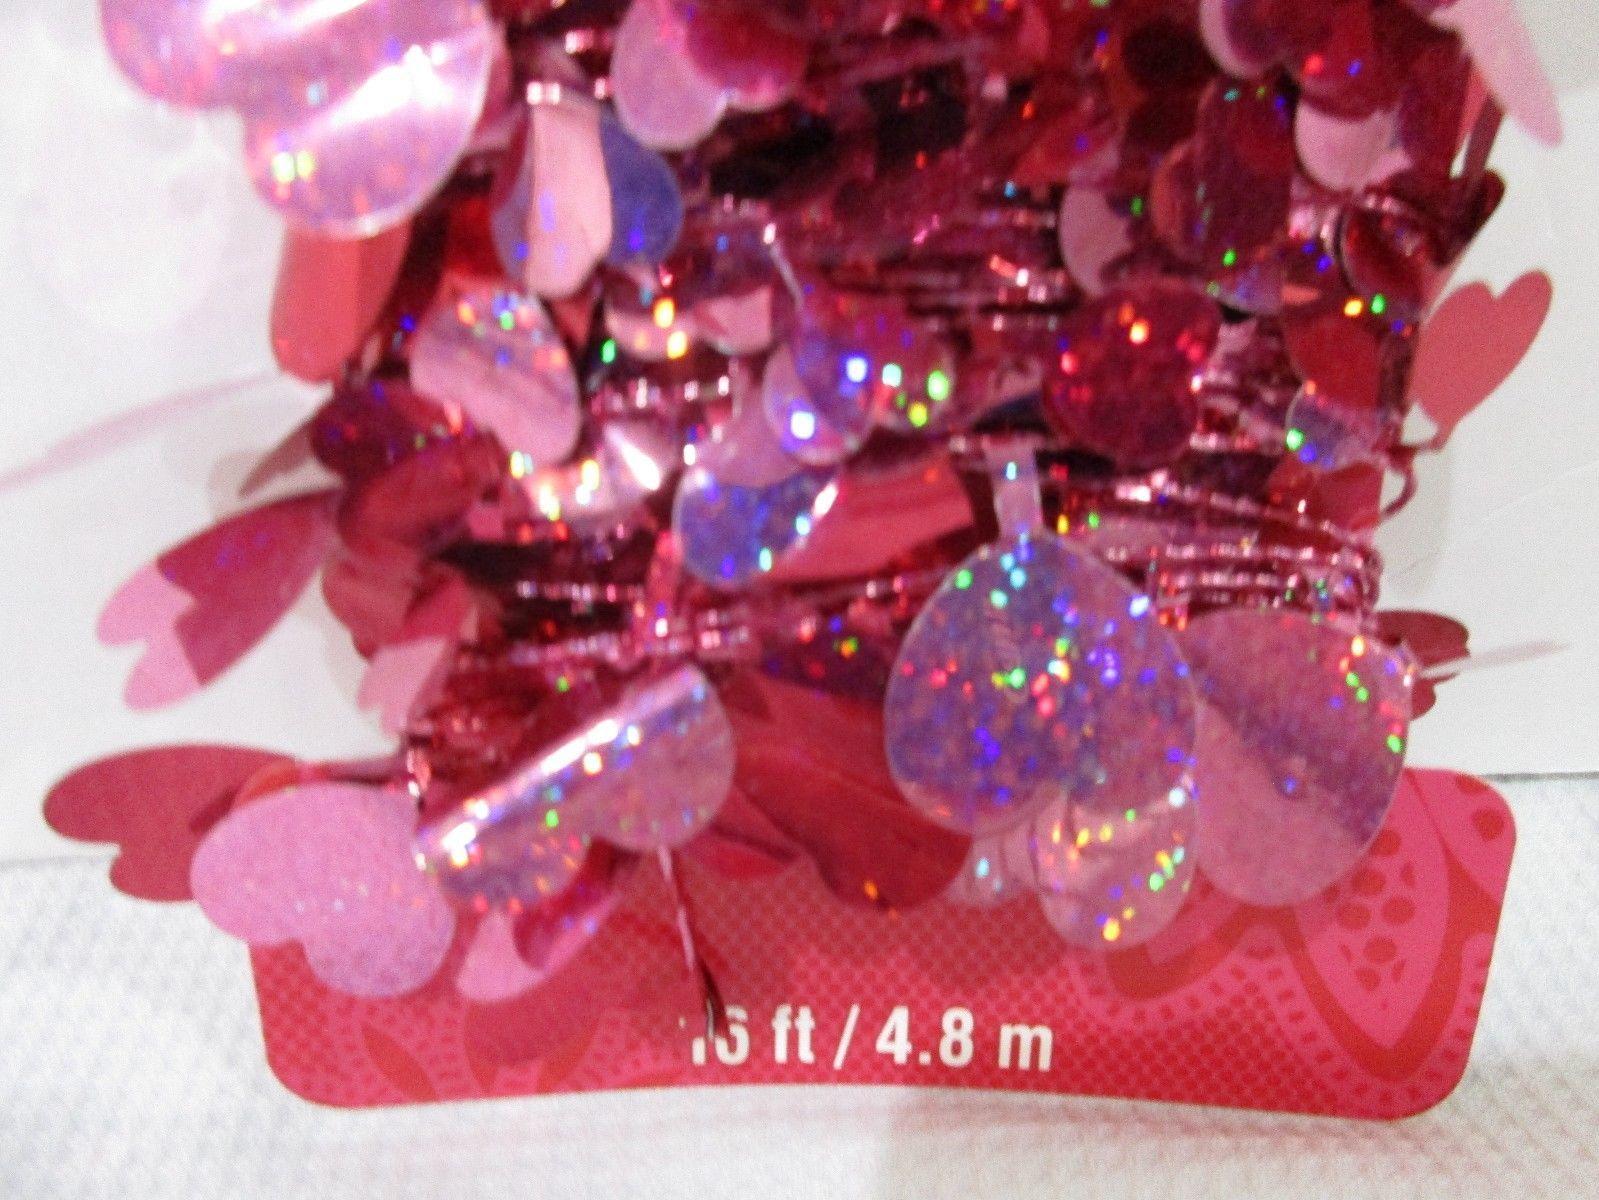 Valentines Day Foil Red Pink Heart Foil Garland Decoration Decor 16FT